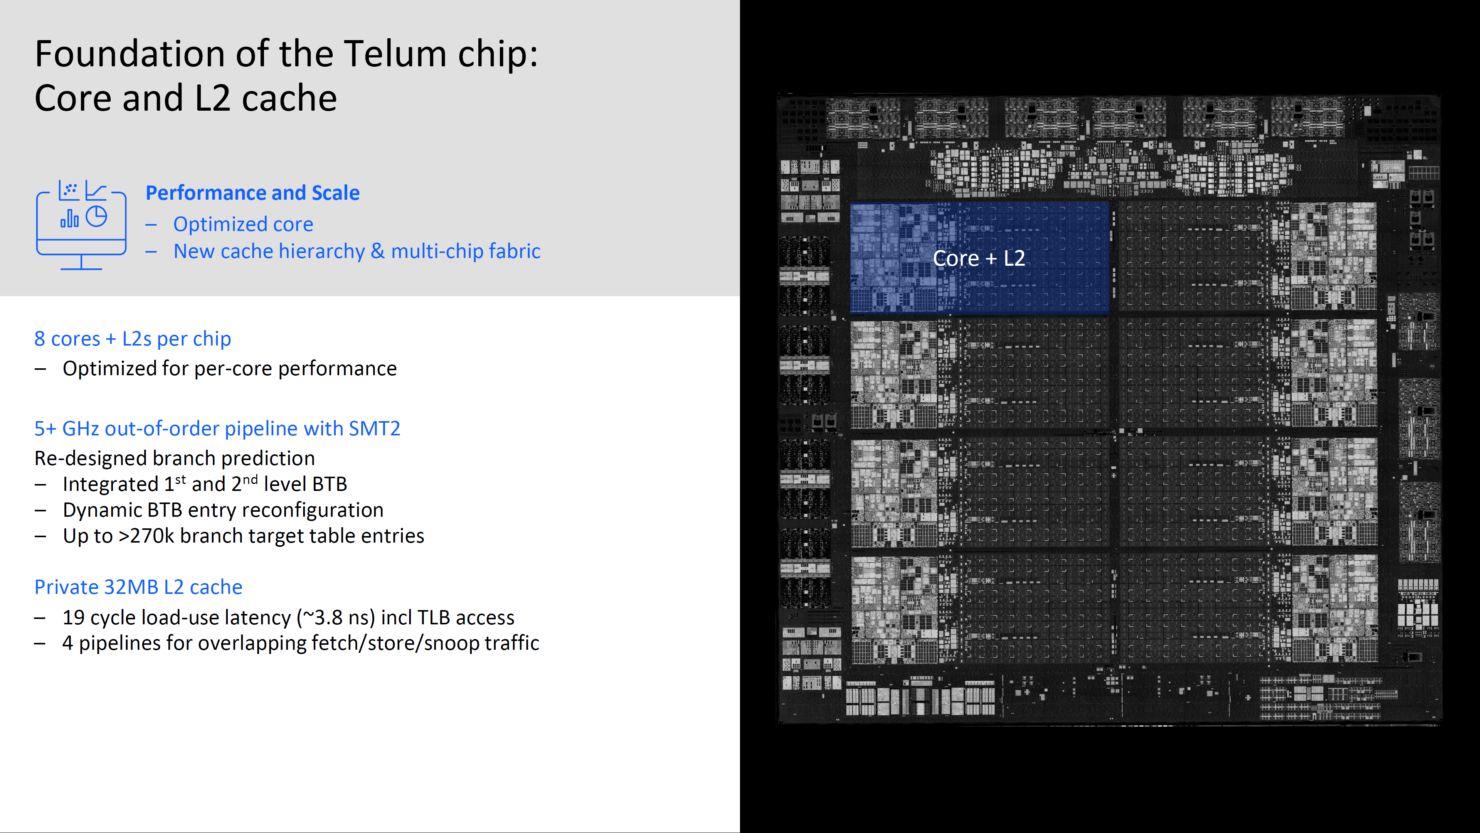 ibm-z-telum-chip-processor-_-samsung-7nm-_2